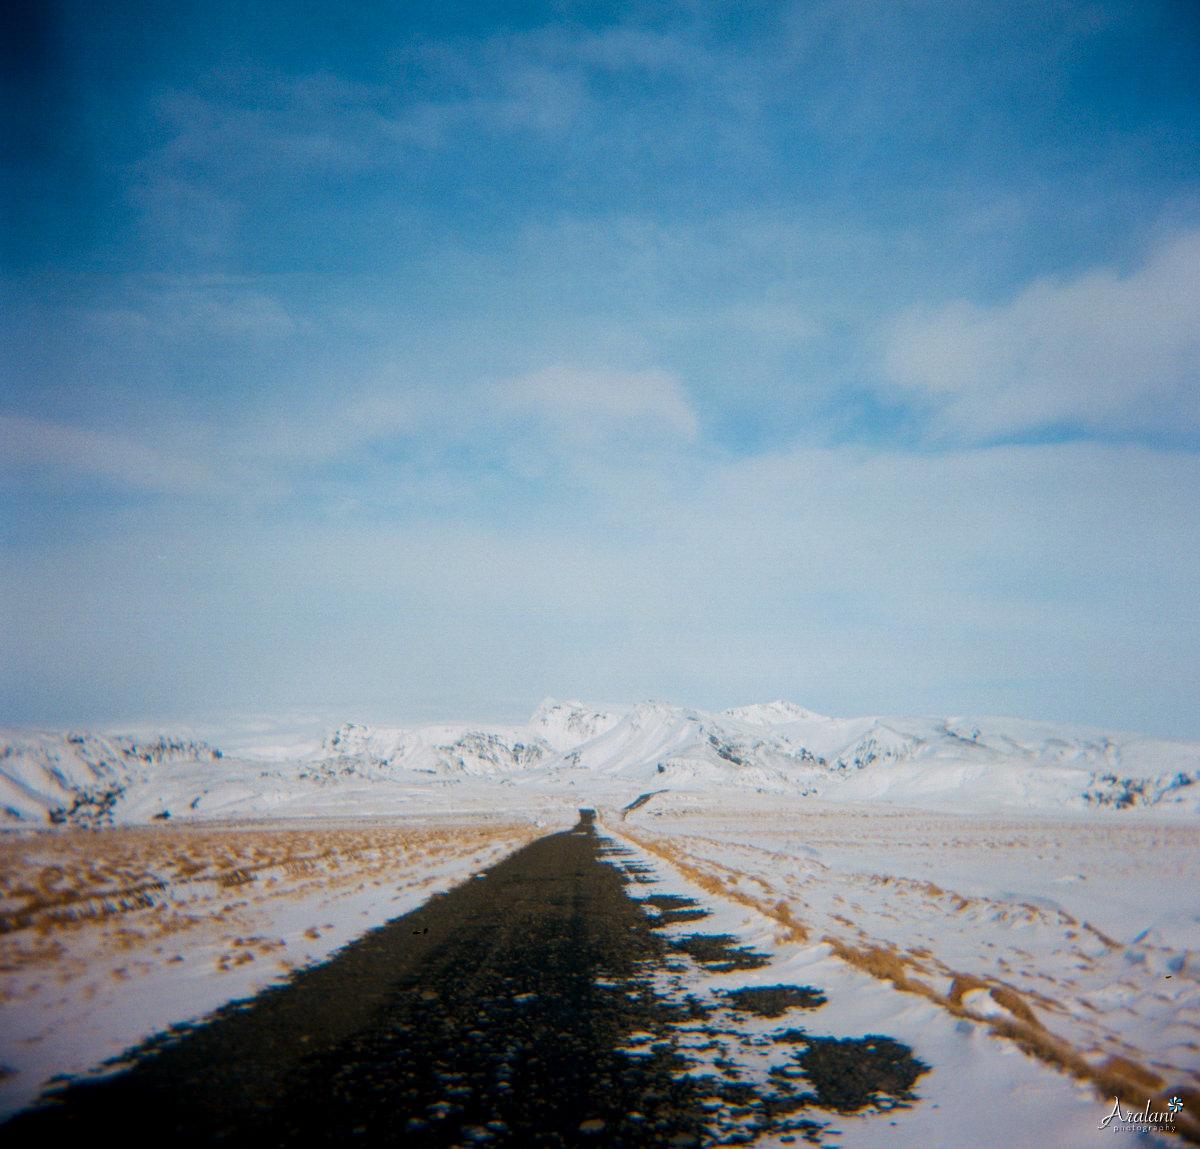 Iceland_Aralani0060.jpg